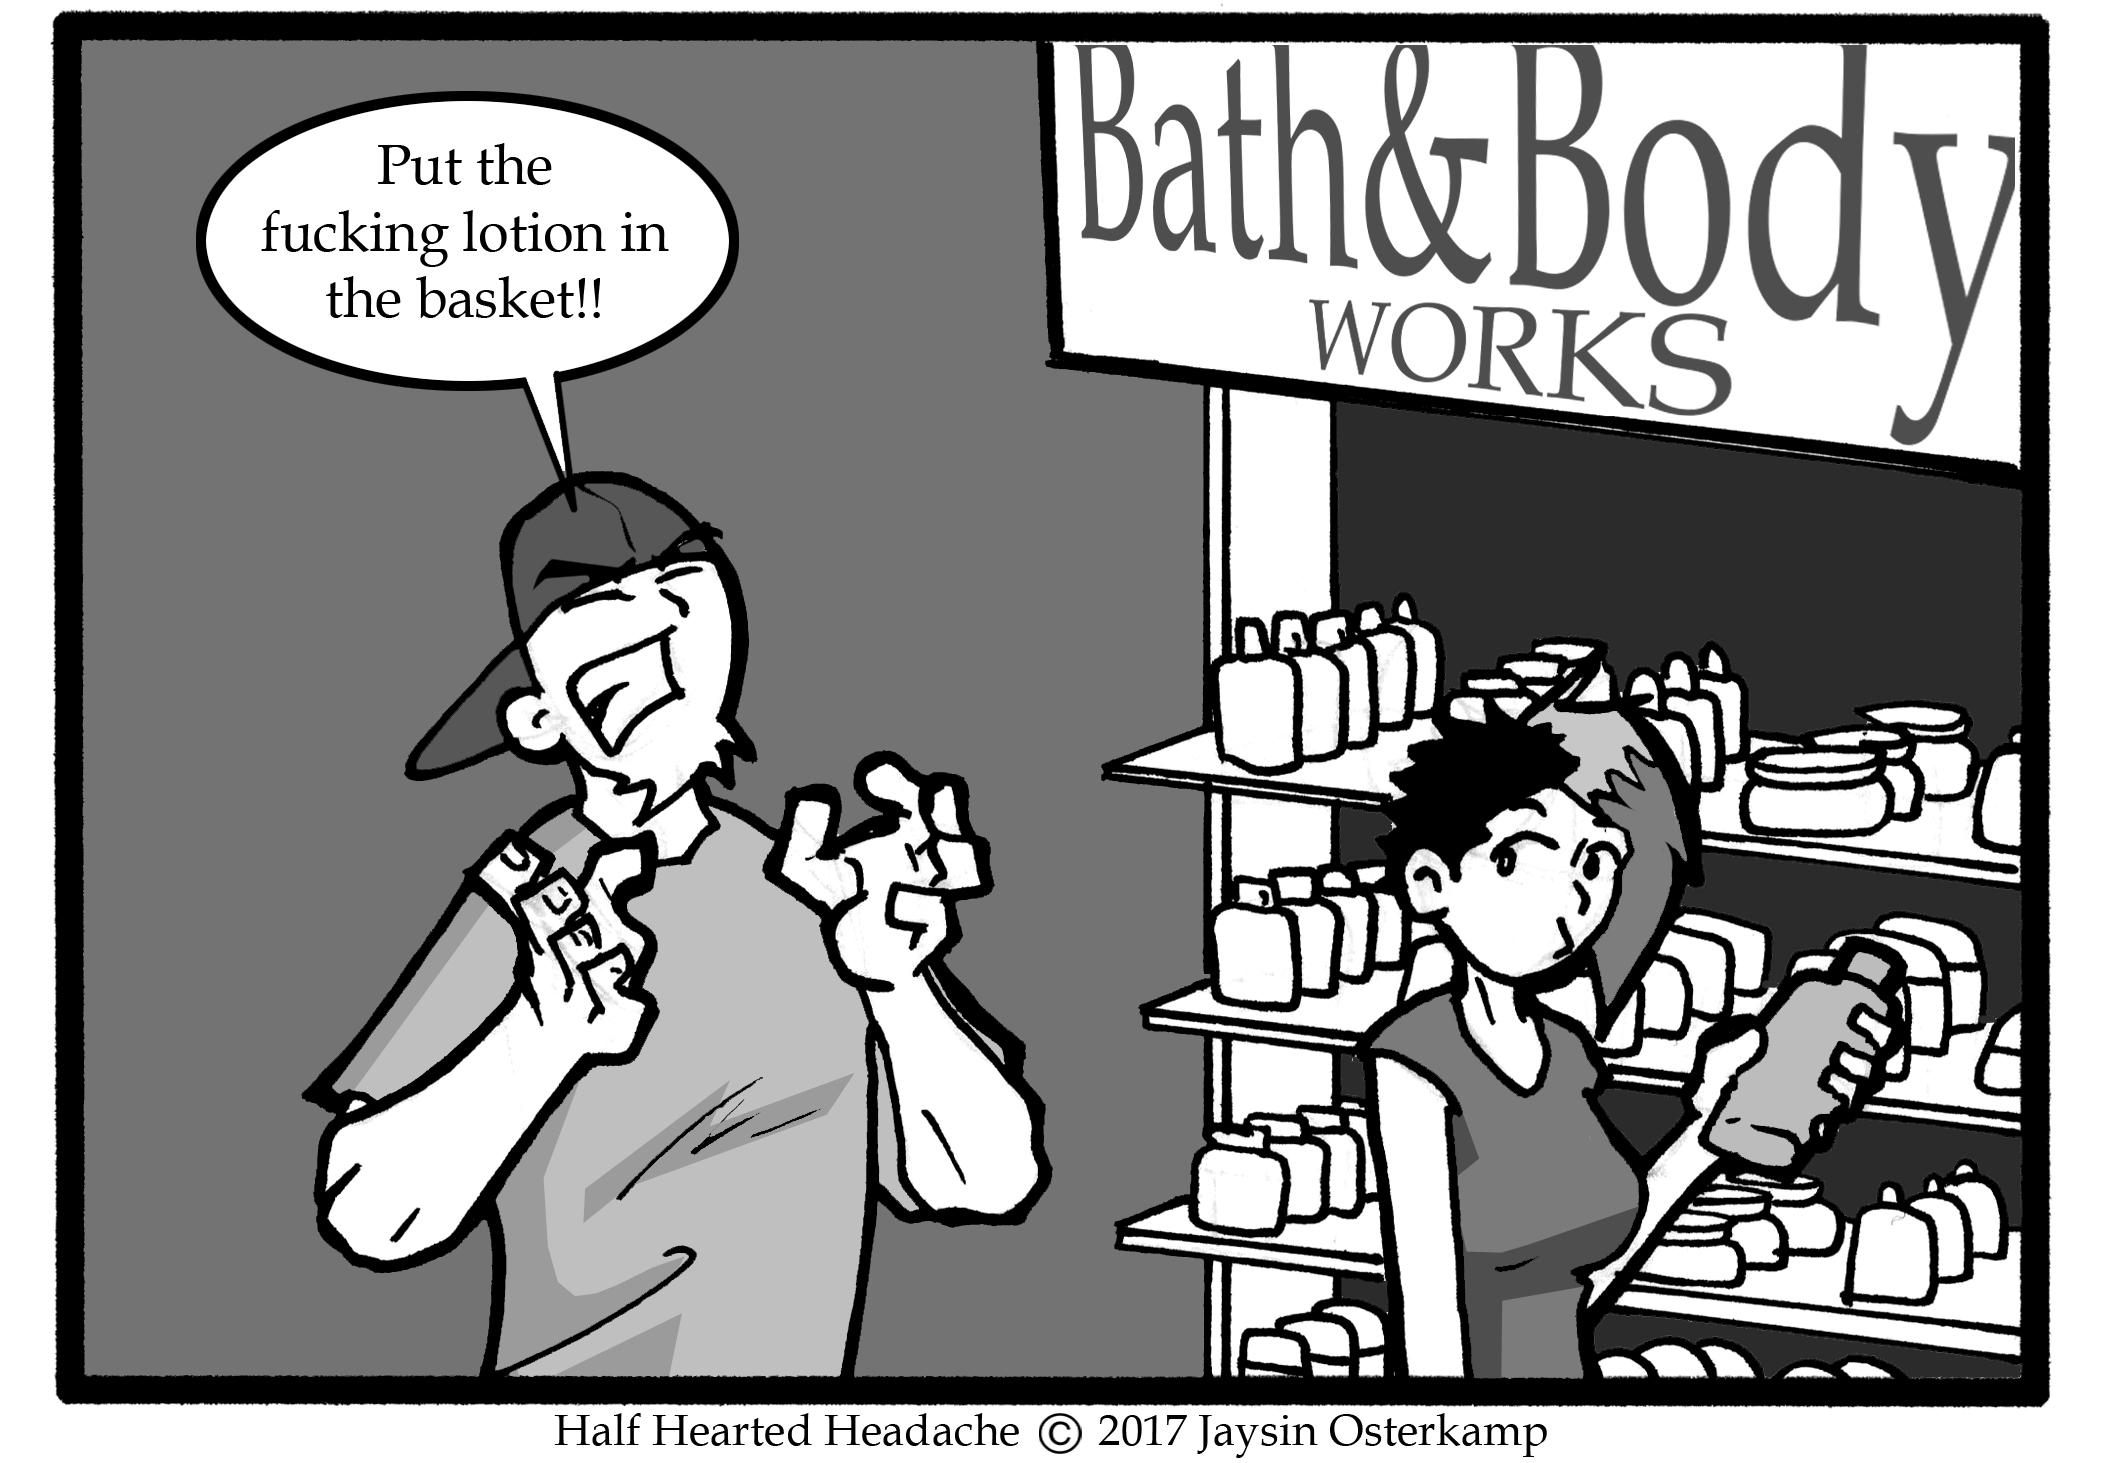 304 – Bath & Body Works